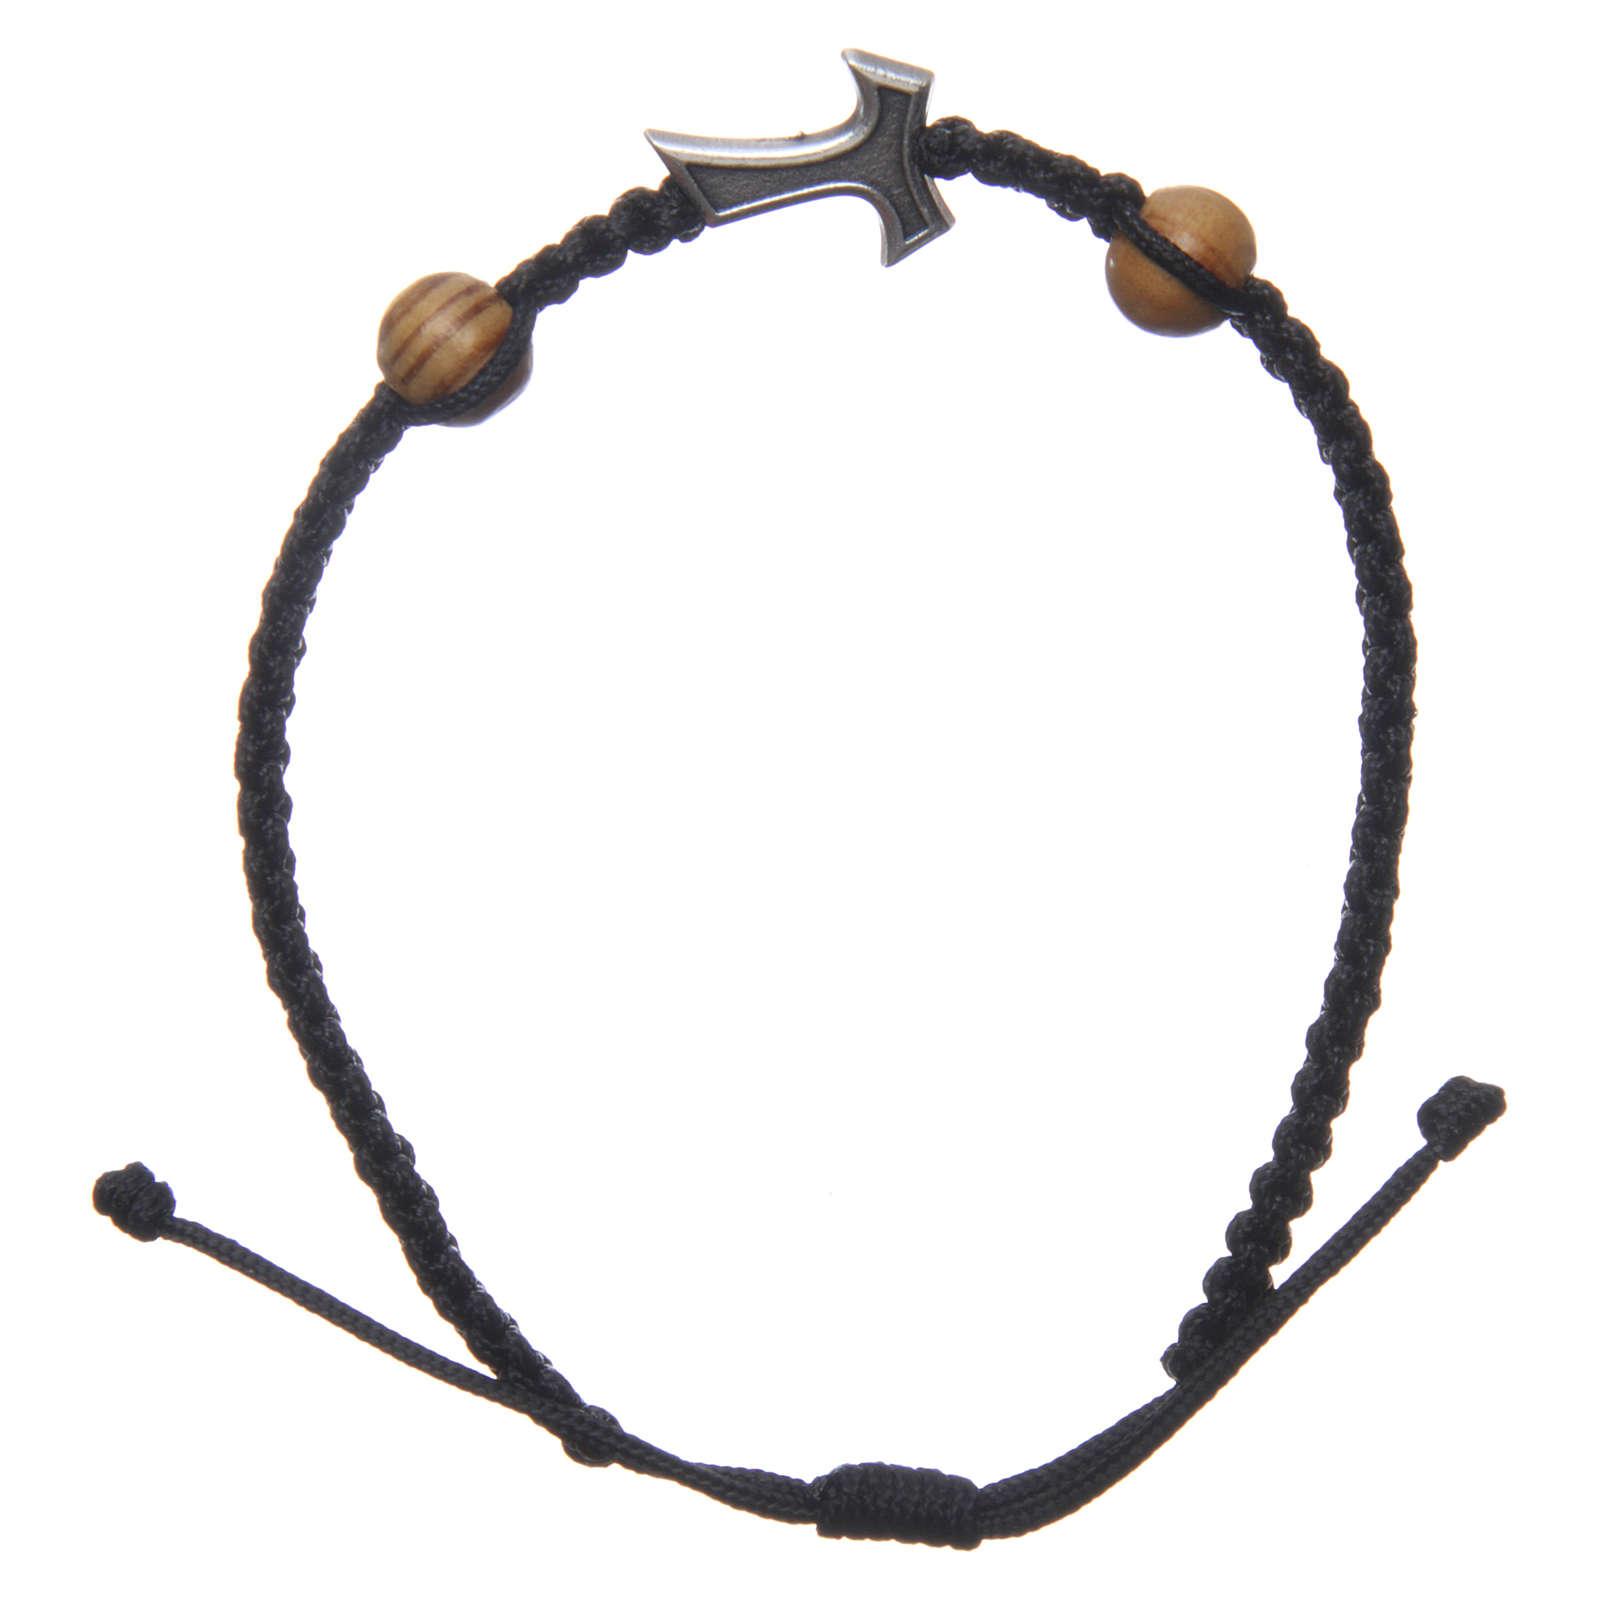 Bracciale Medjugorje corda nera croce Tau 2 grani 4